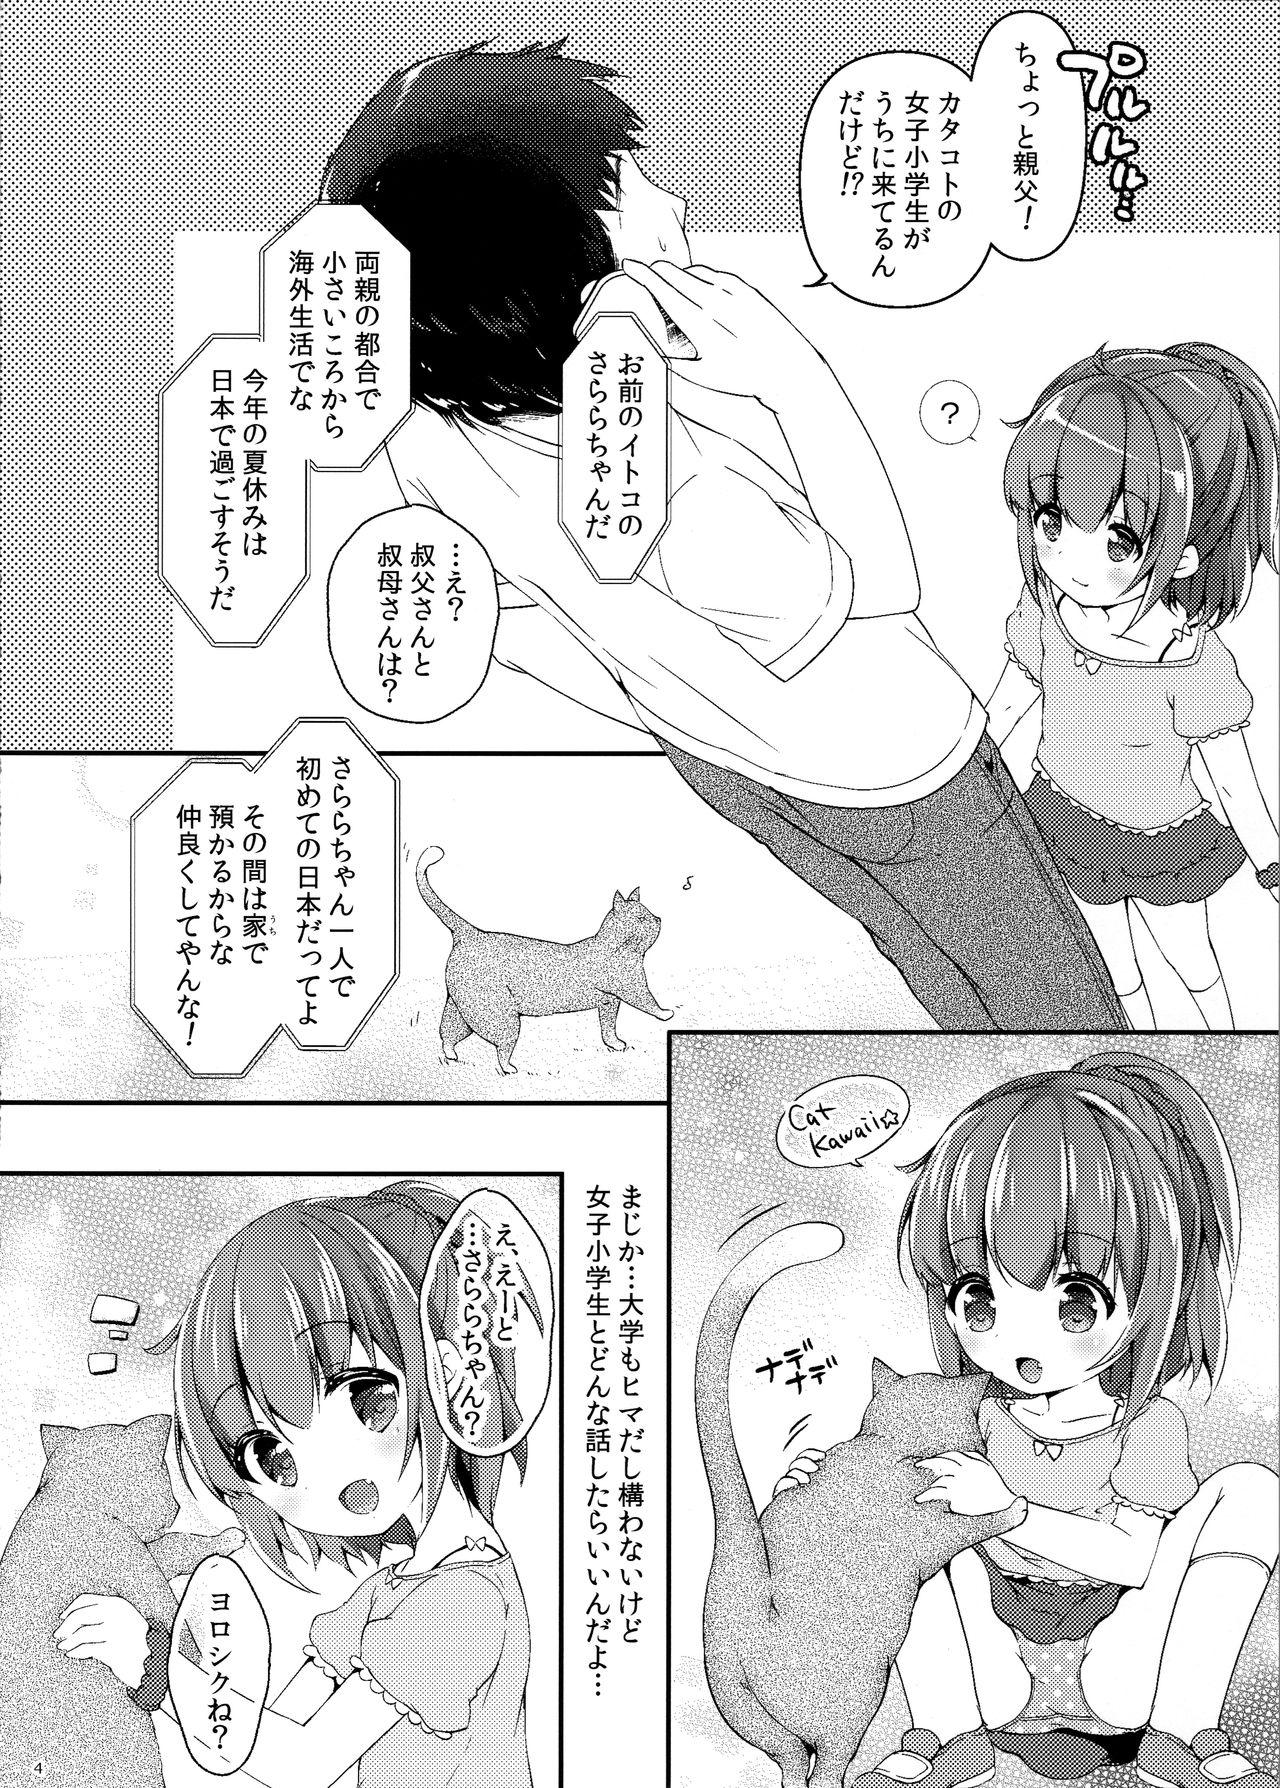 Seifuku Cosplay 2